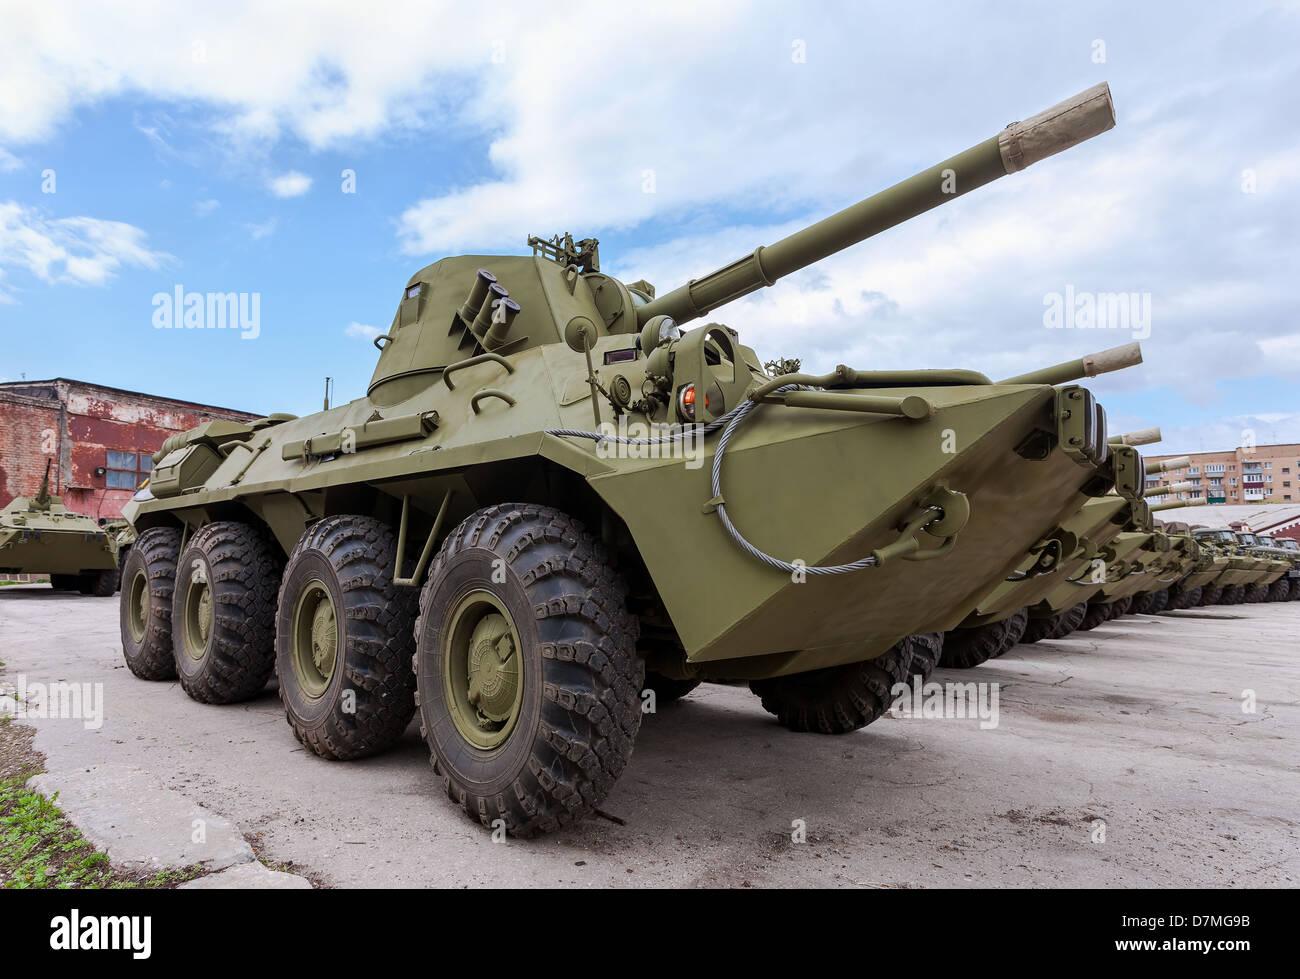 Self-propelled gun NONA-SVK - Stock Image